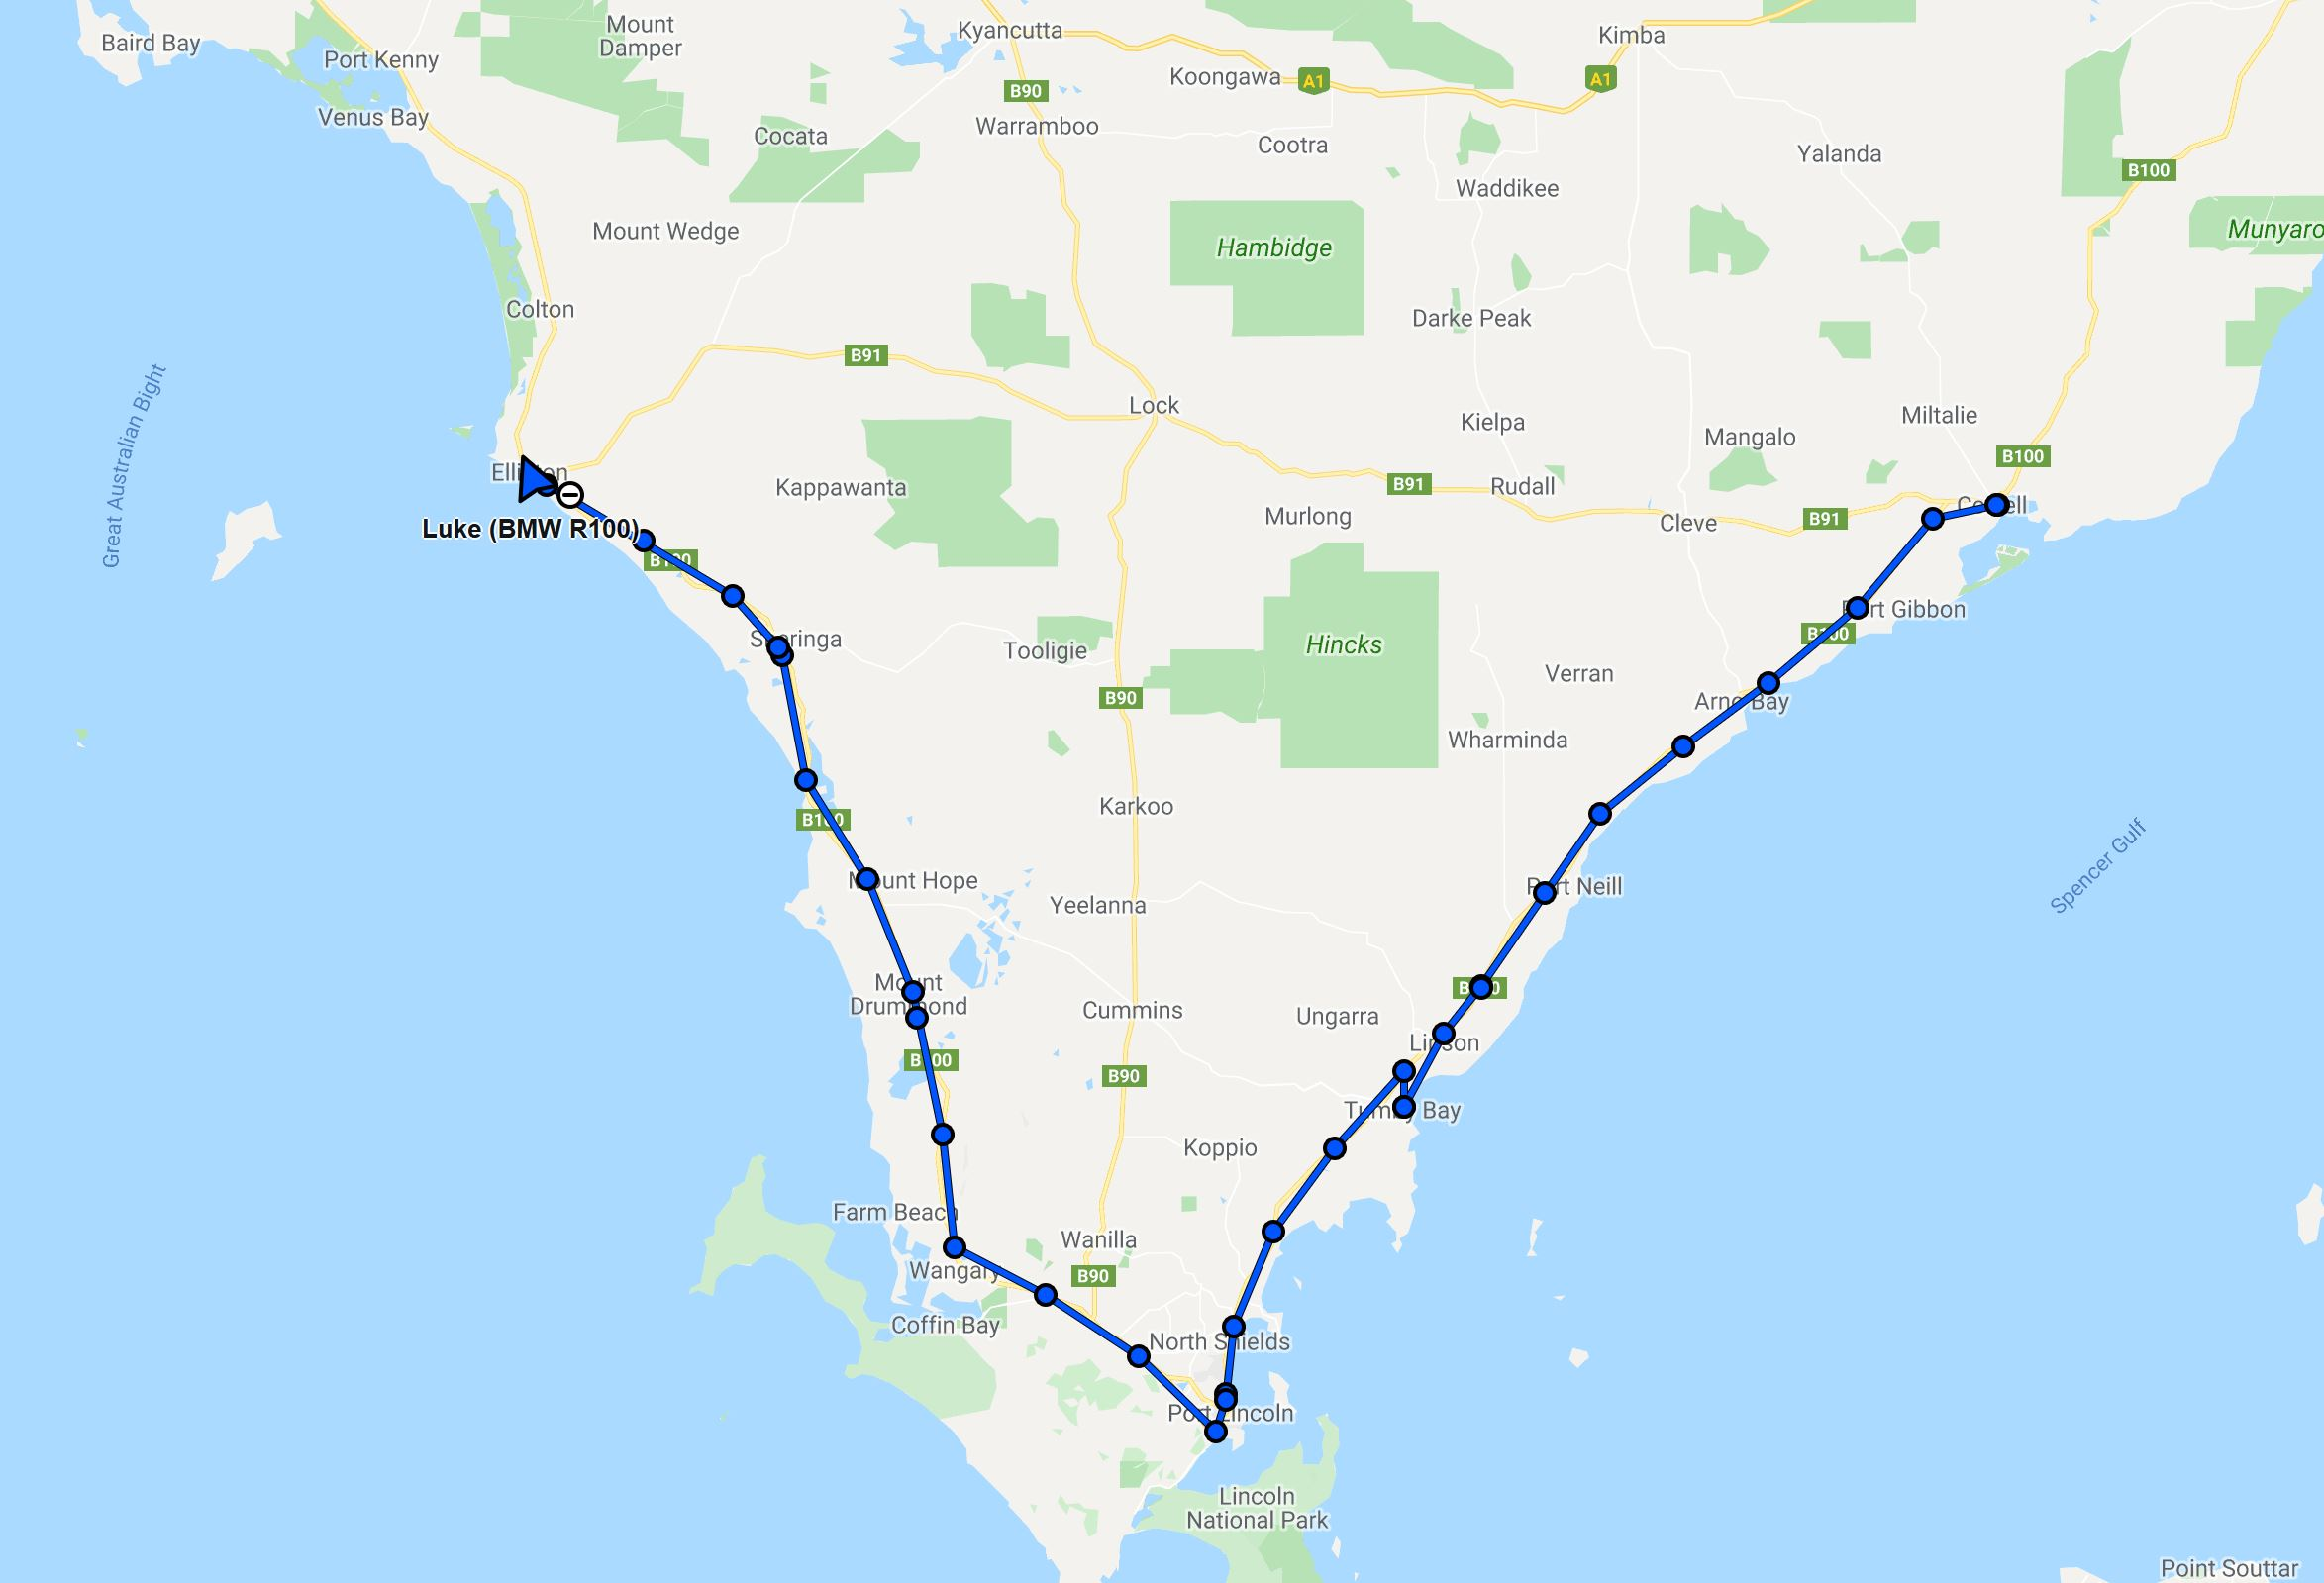 Perth Trip – Day 19 – 2019/12/20